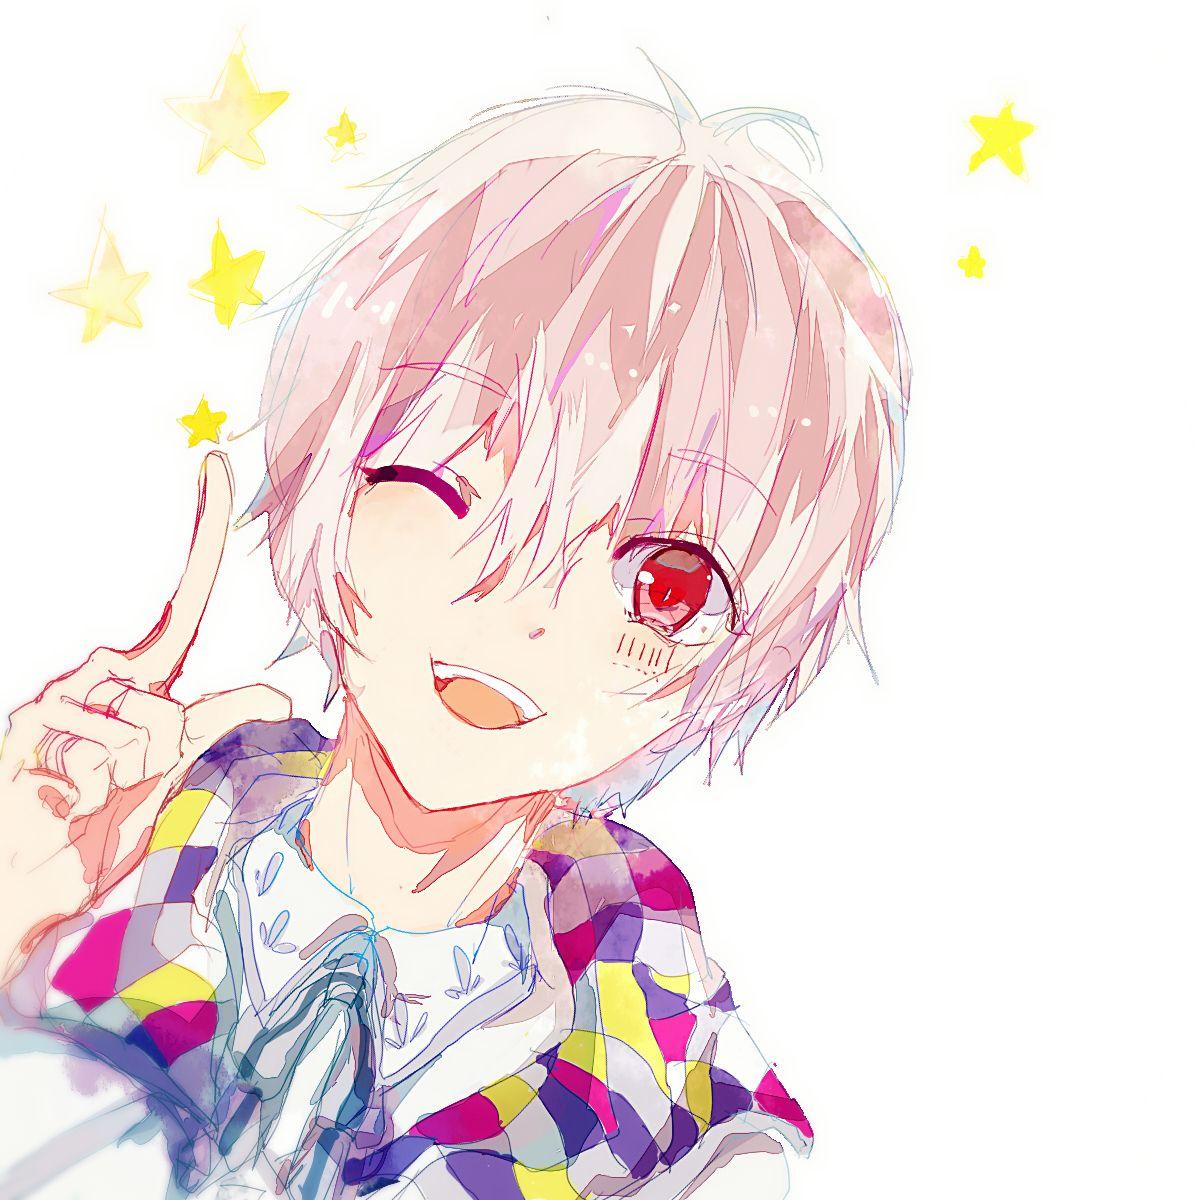 Mafumafu Anime images, Anime, Kawaii anime